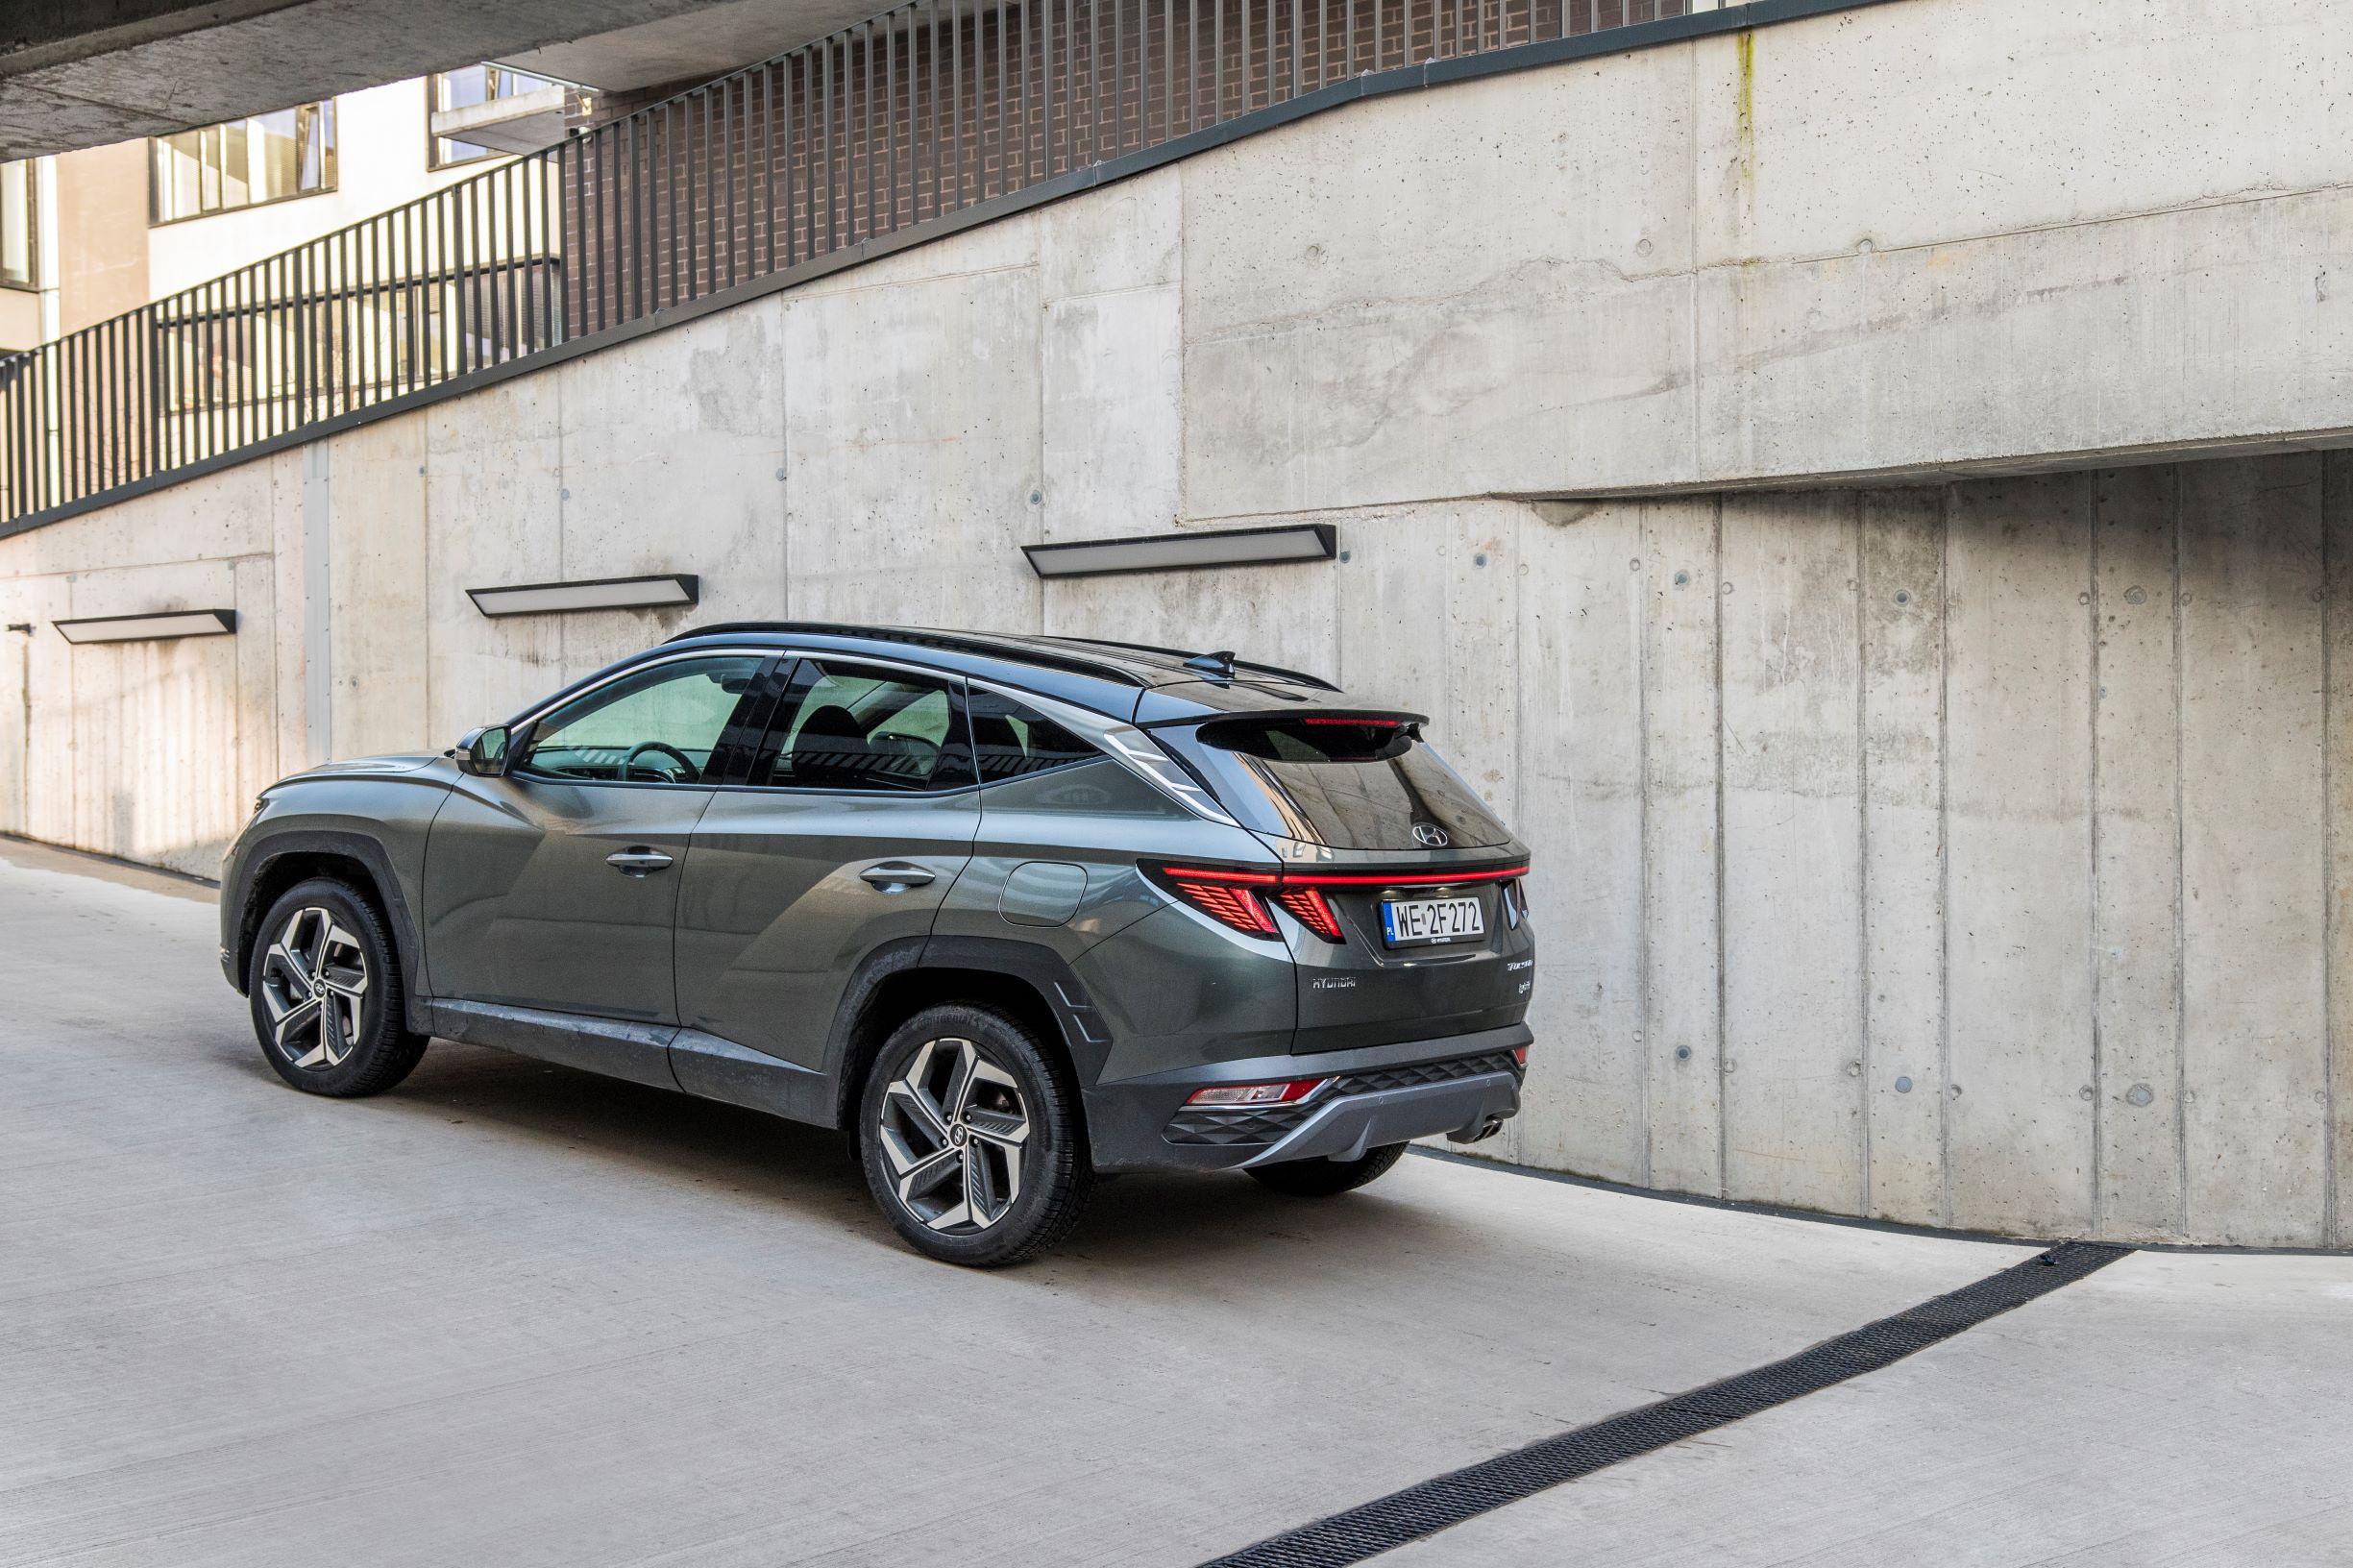 Hyundai Tucson 1.6 T-GDI HEV - lewy tył